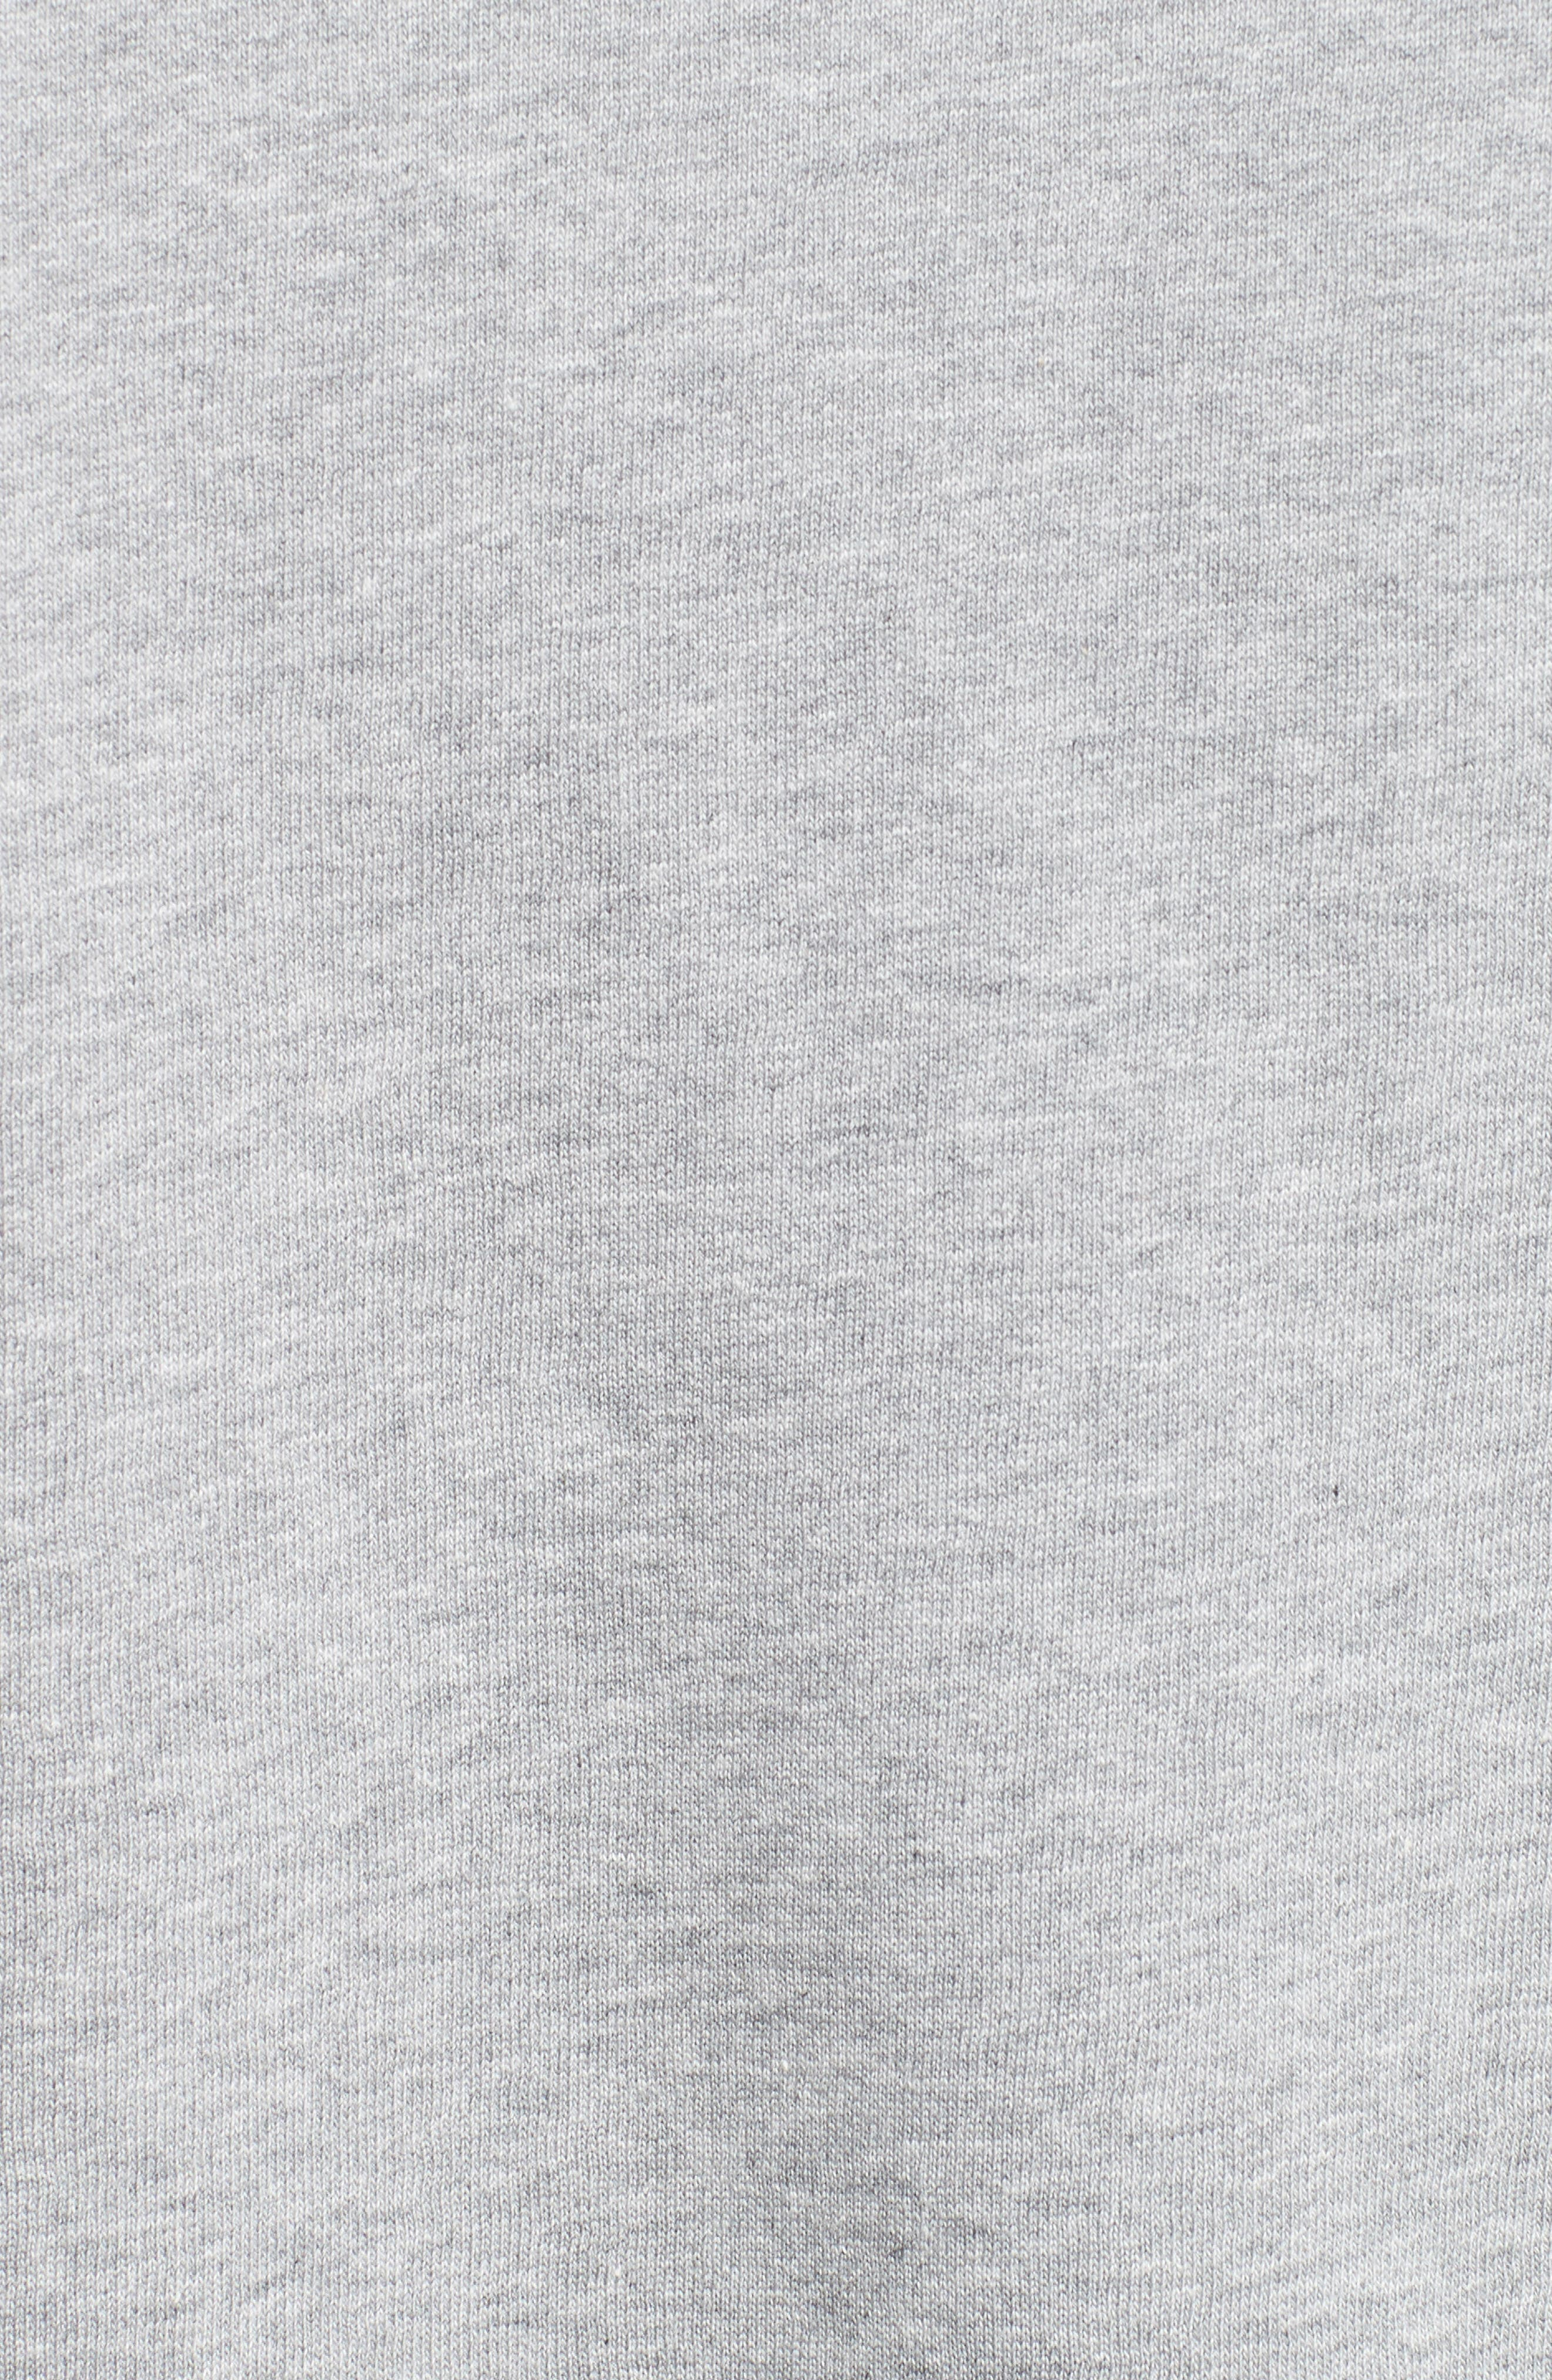 Juliano Embellished Sweatshirt,                             Alternate thumbnail 5, color,                             050